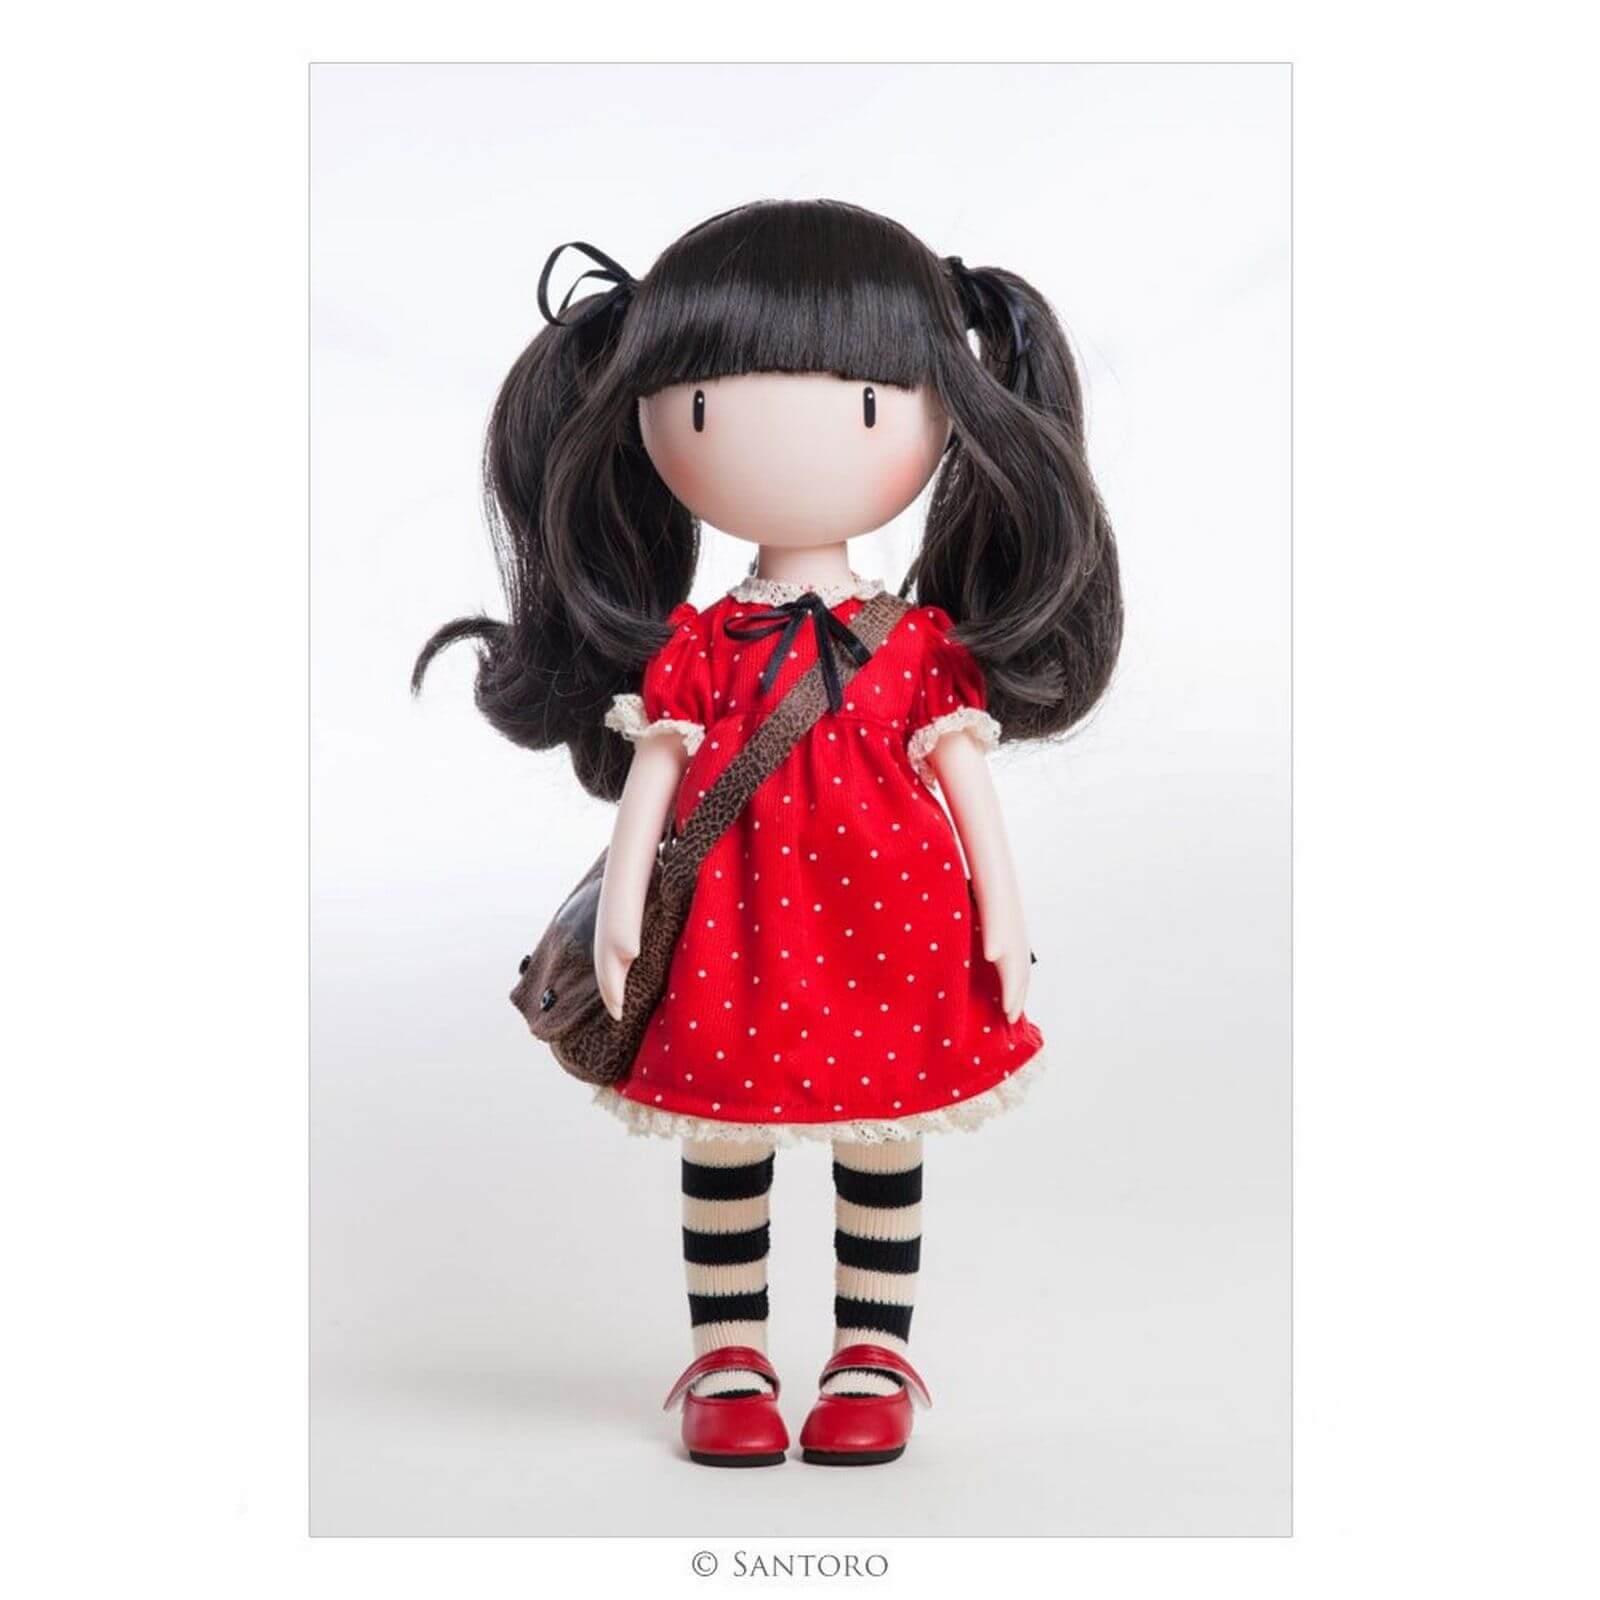 Santoro London Gorjuss Doll Ruby Jadrem Toys